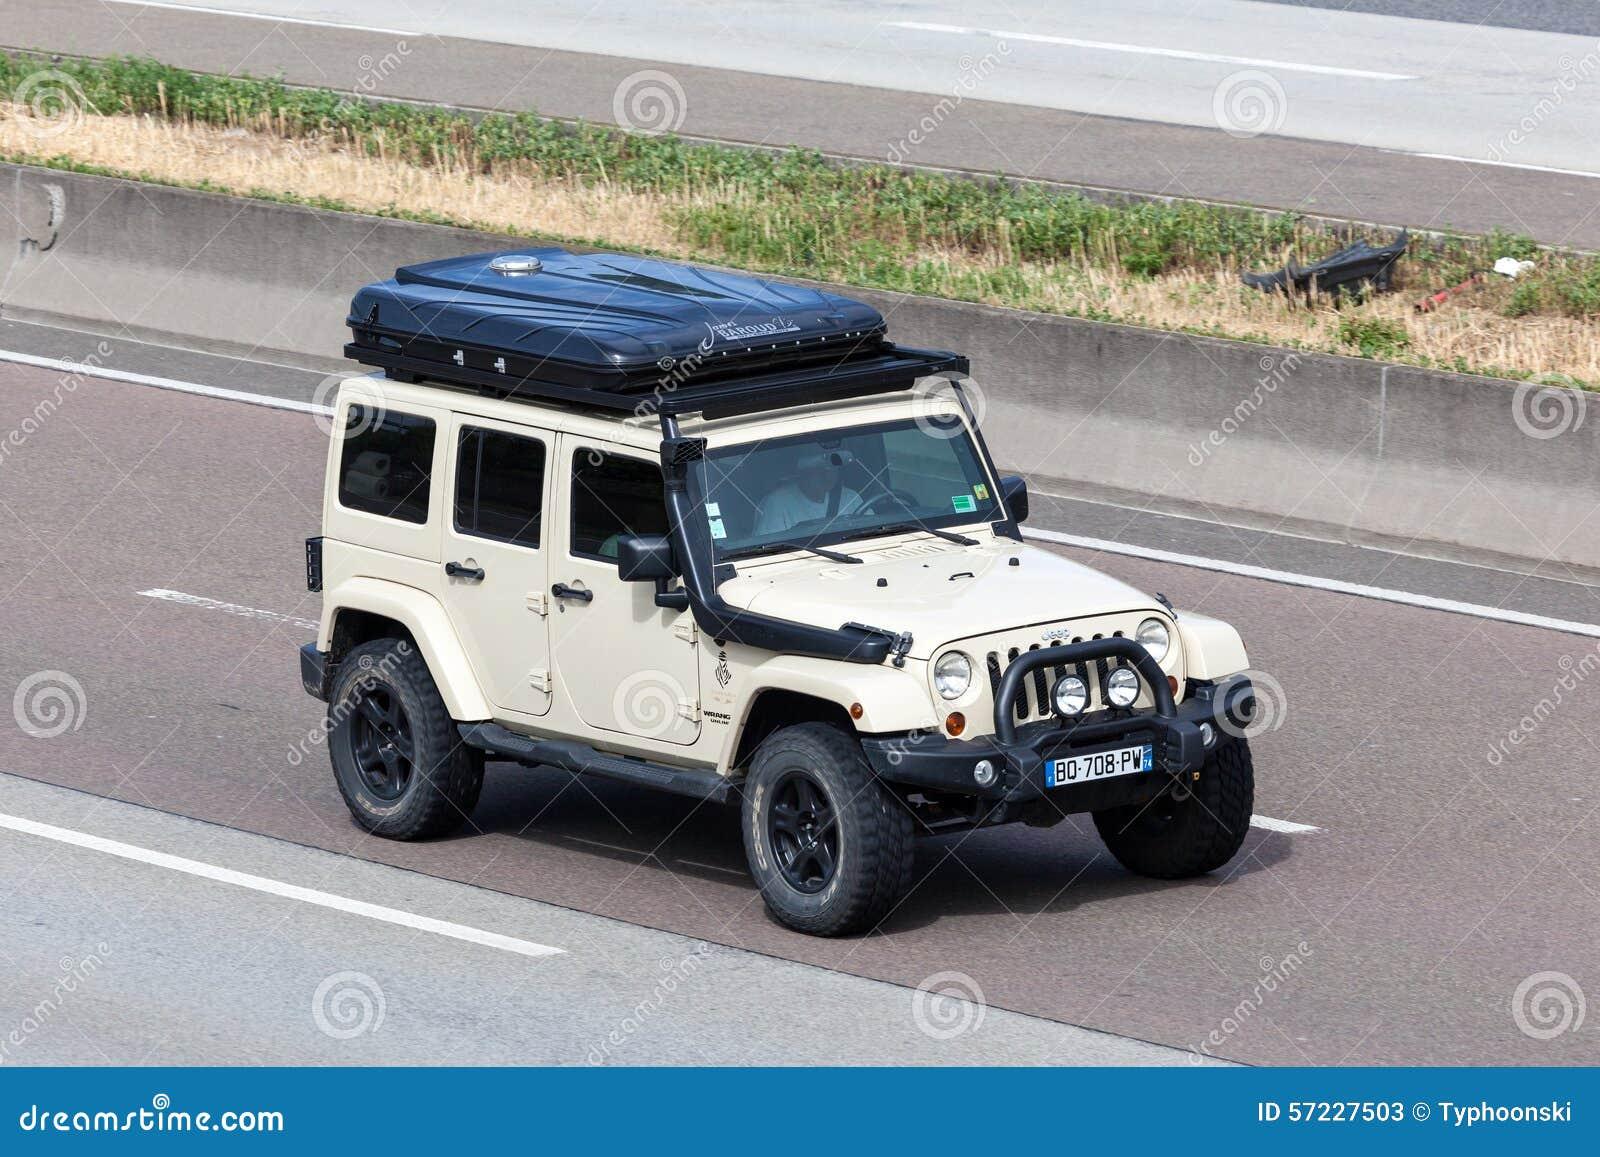 jeep wrangler unlimited sahara avec une tente de toit photo stock ditorial image 57227503. Black Bedroom Furniture Sets. Home Design Ideas